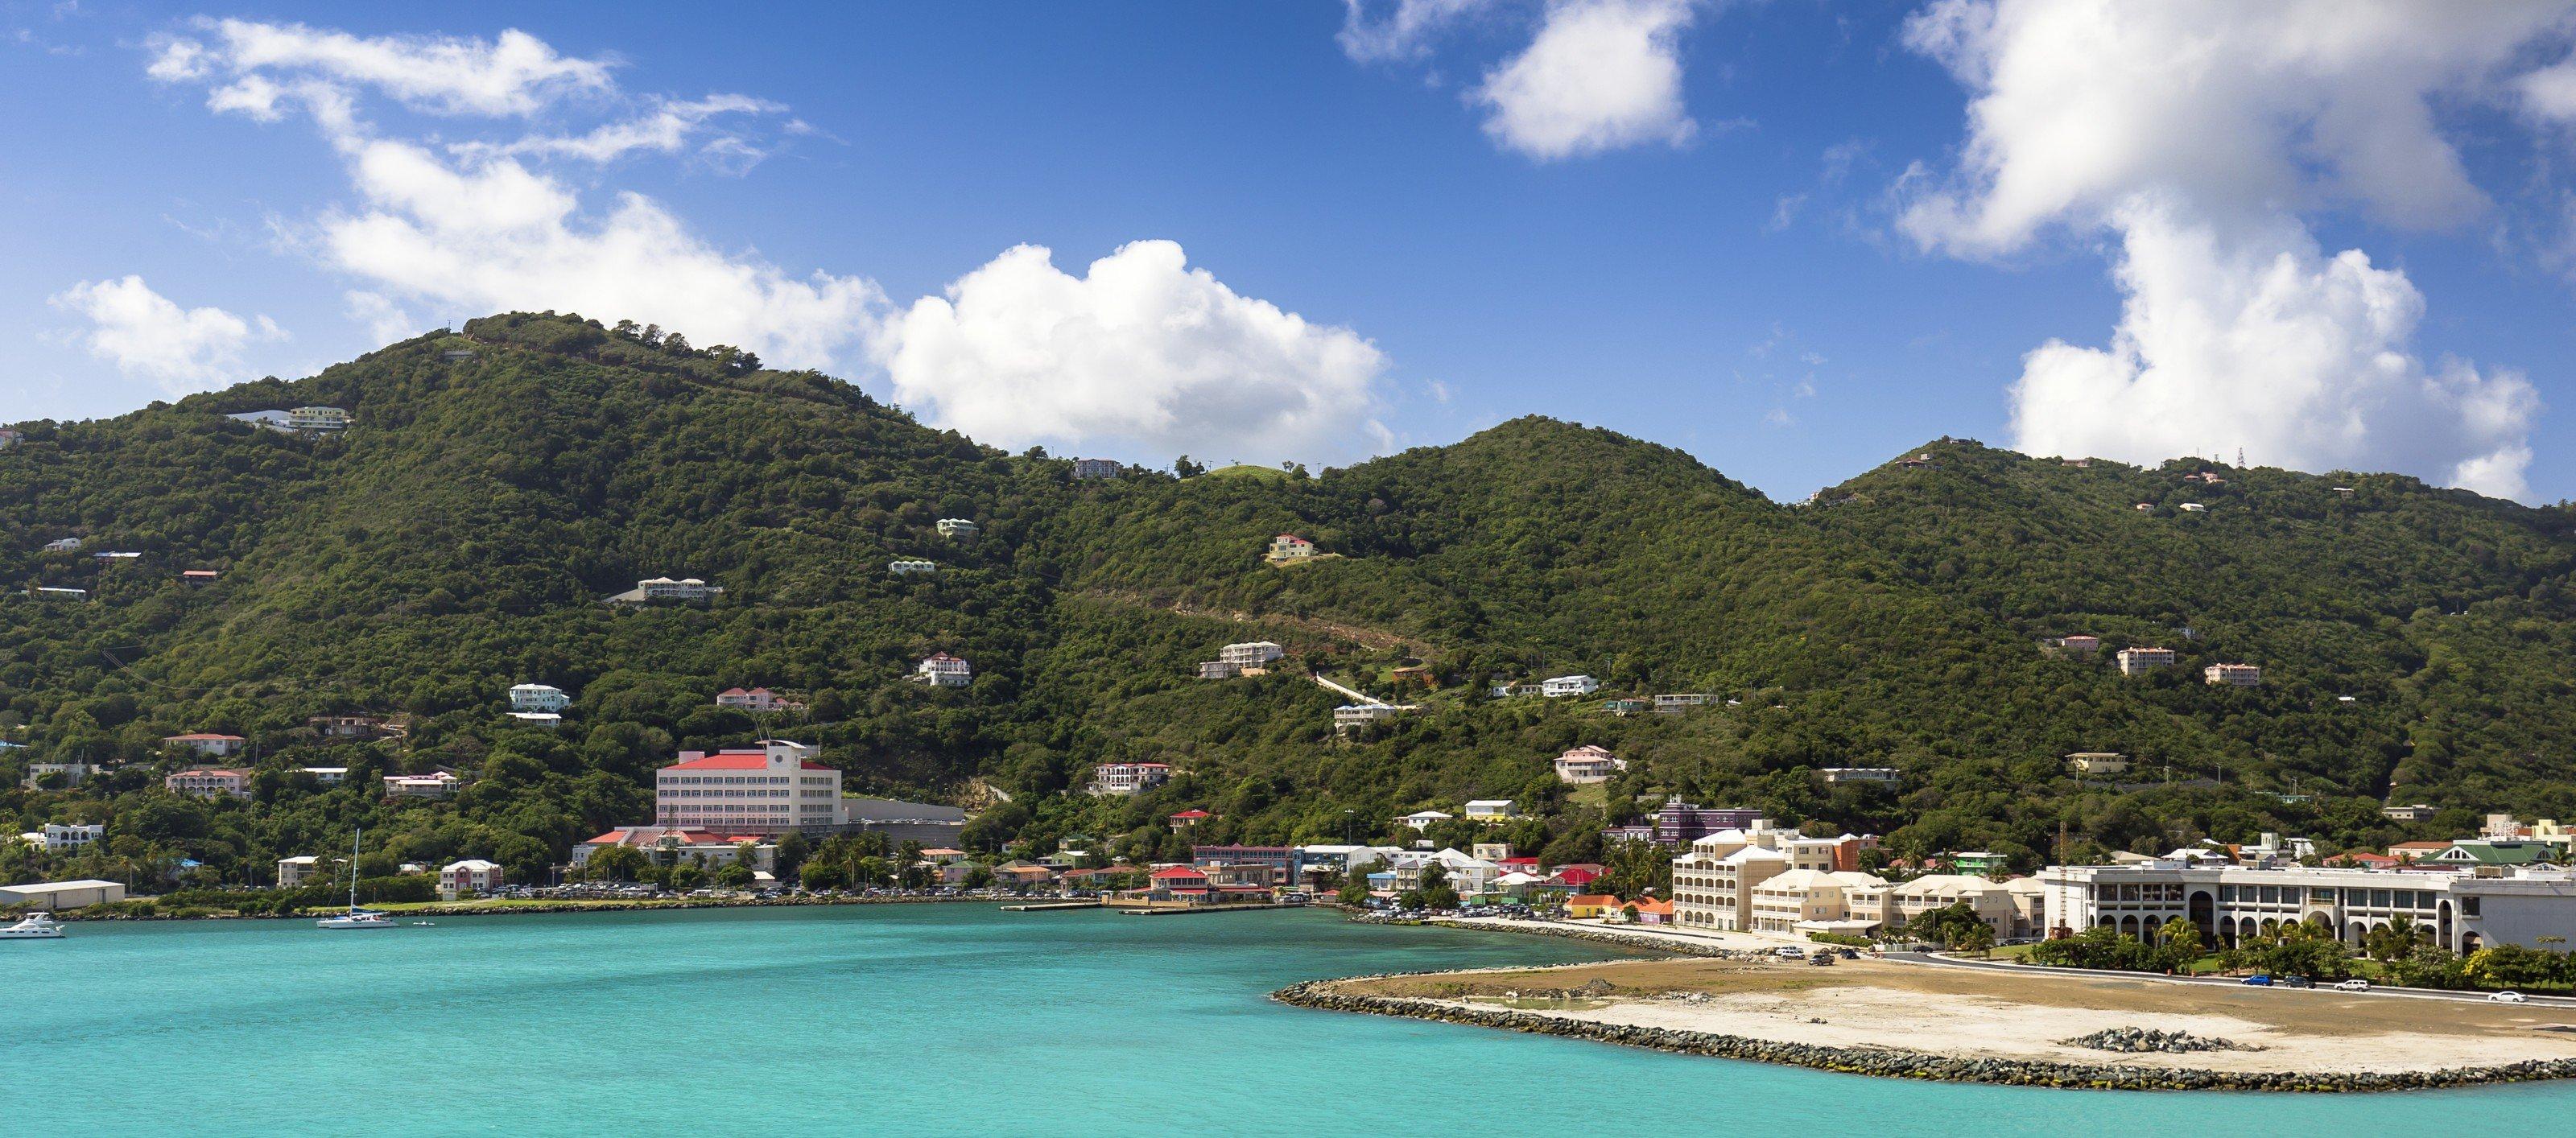 British Virgin Islands Bvi Economic Substance Vistra